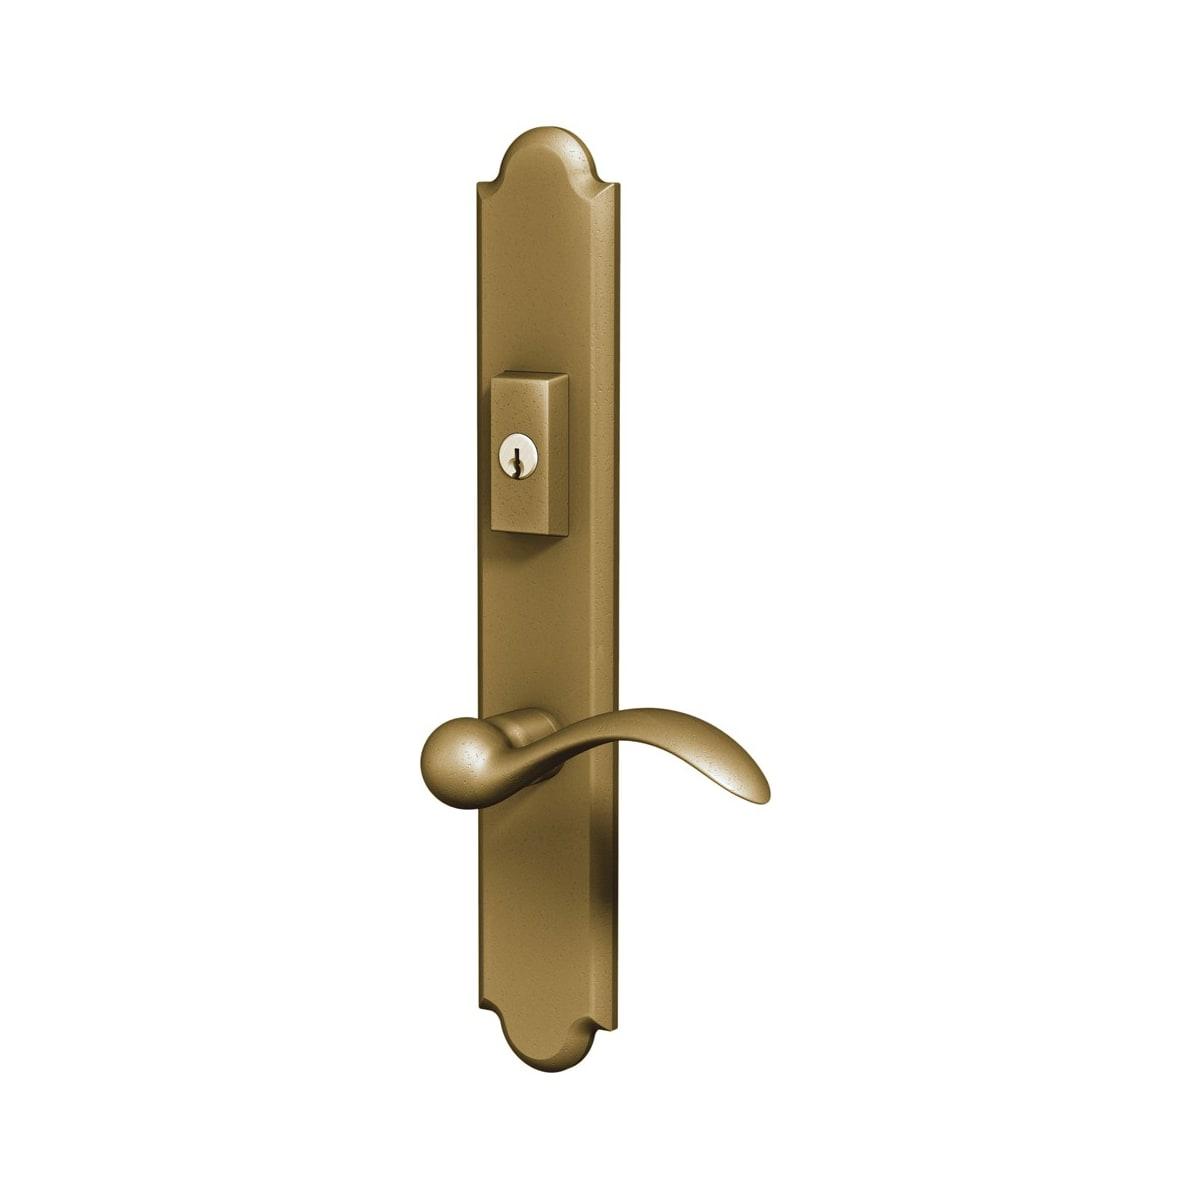 Baldwin Boulder Door Configuration 5 Patio Multi Point Trim Lever Set with American Cylinder Above or Below Handle